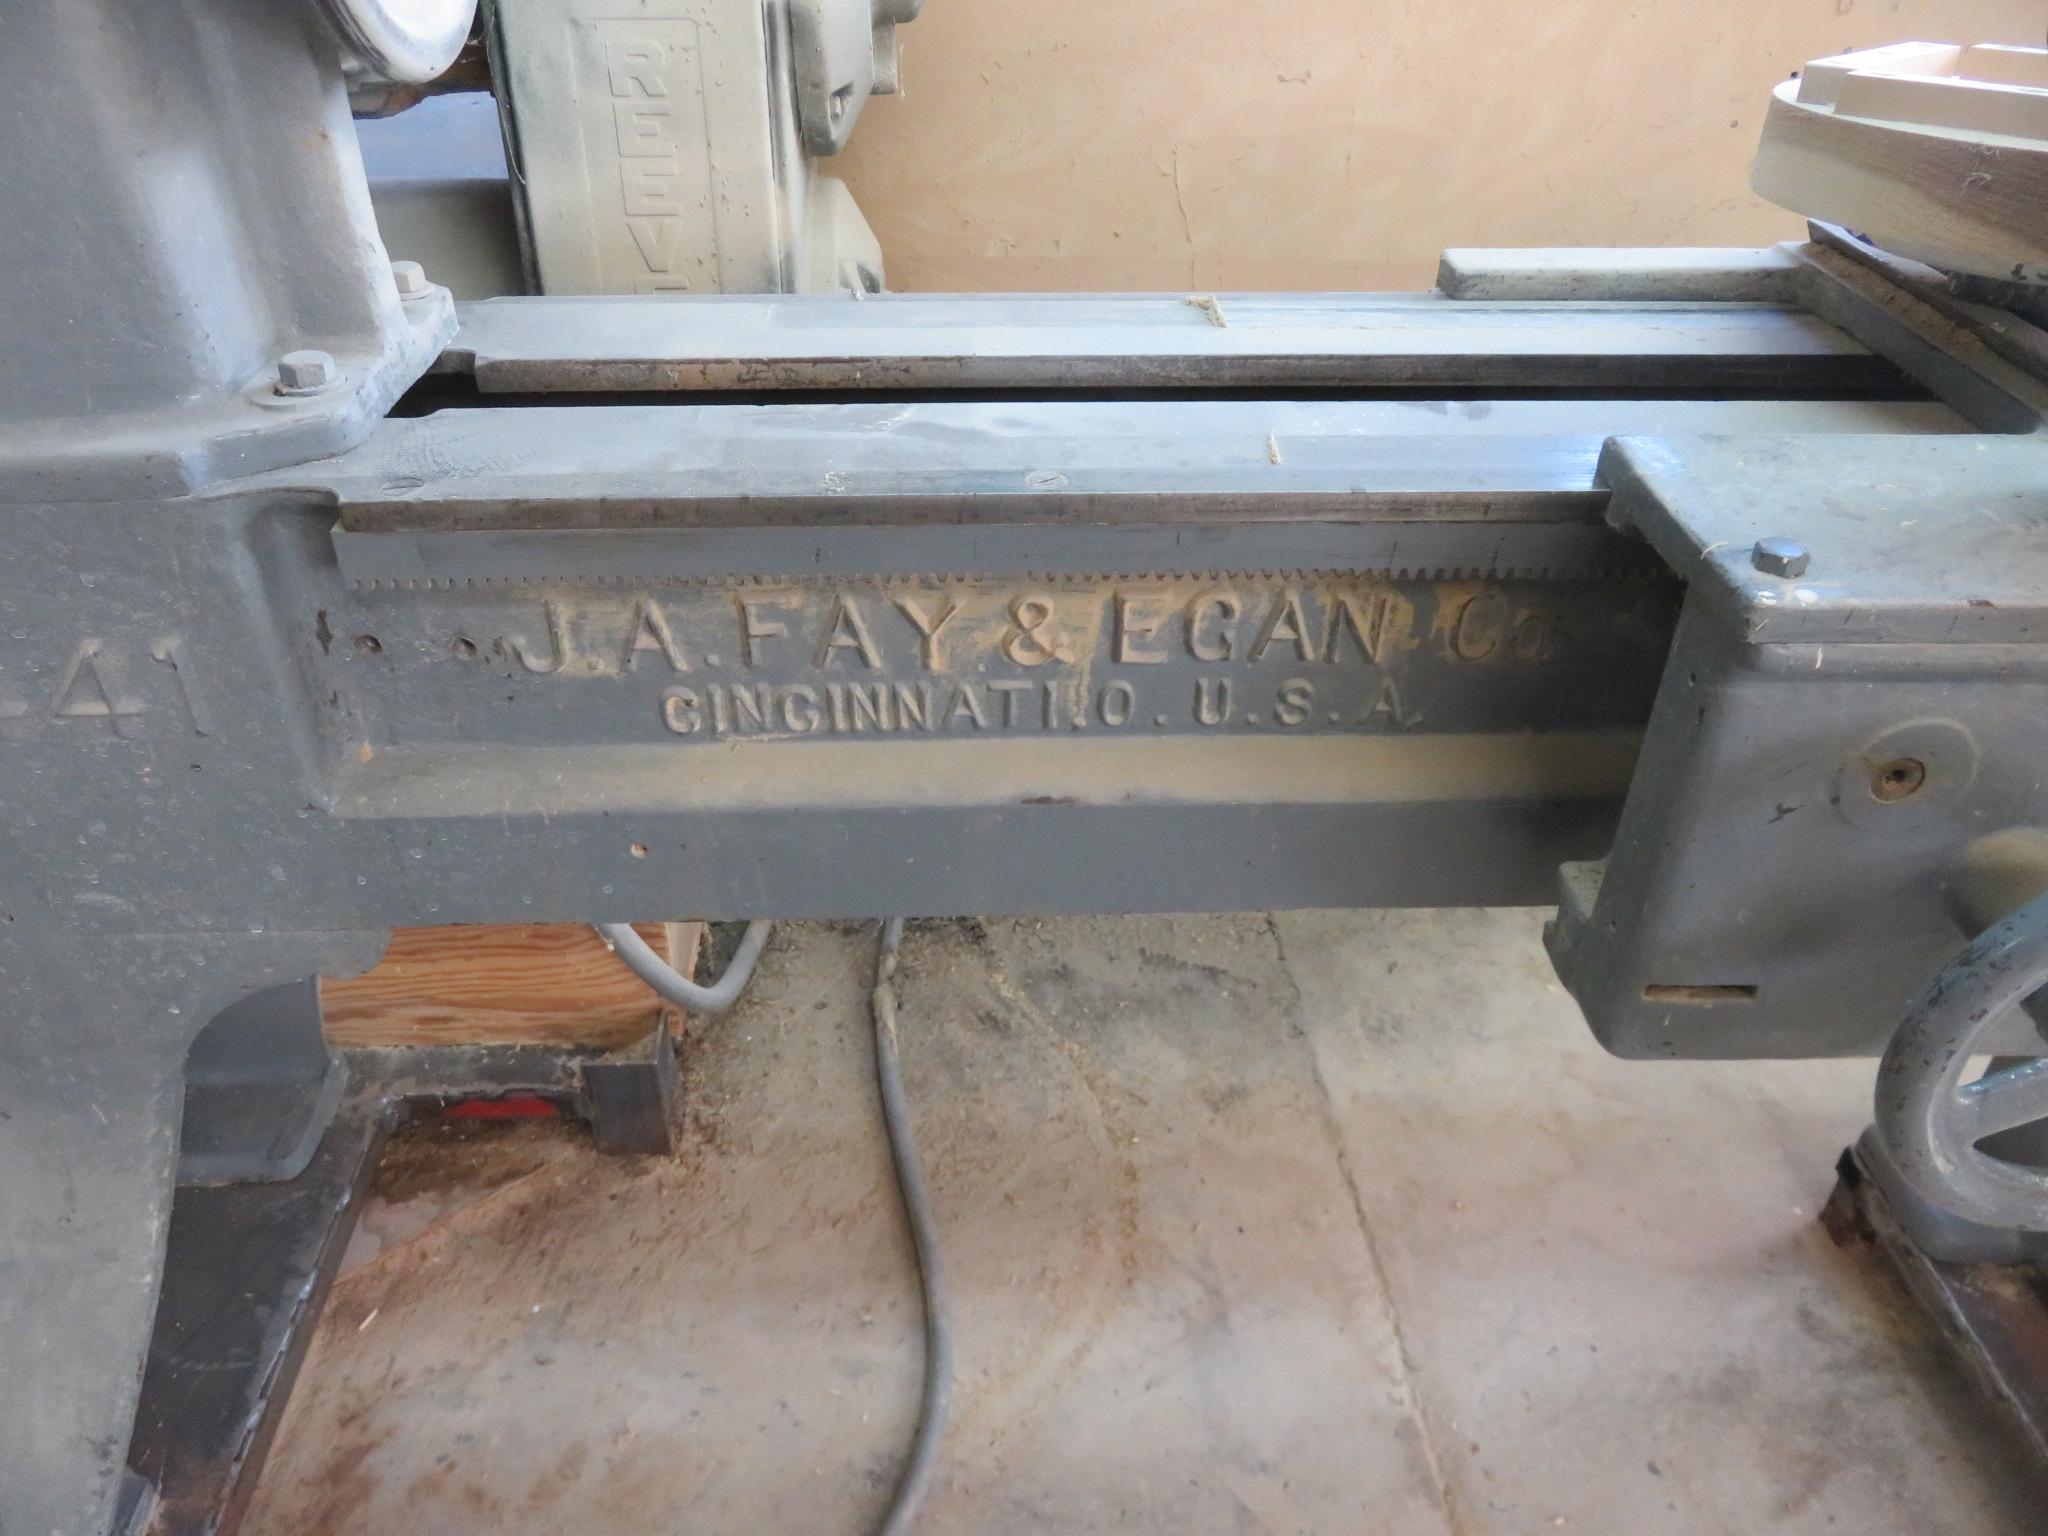 J.A. Fay & Egan Company 8' Lathe - Image 6 of 6